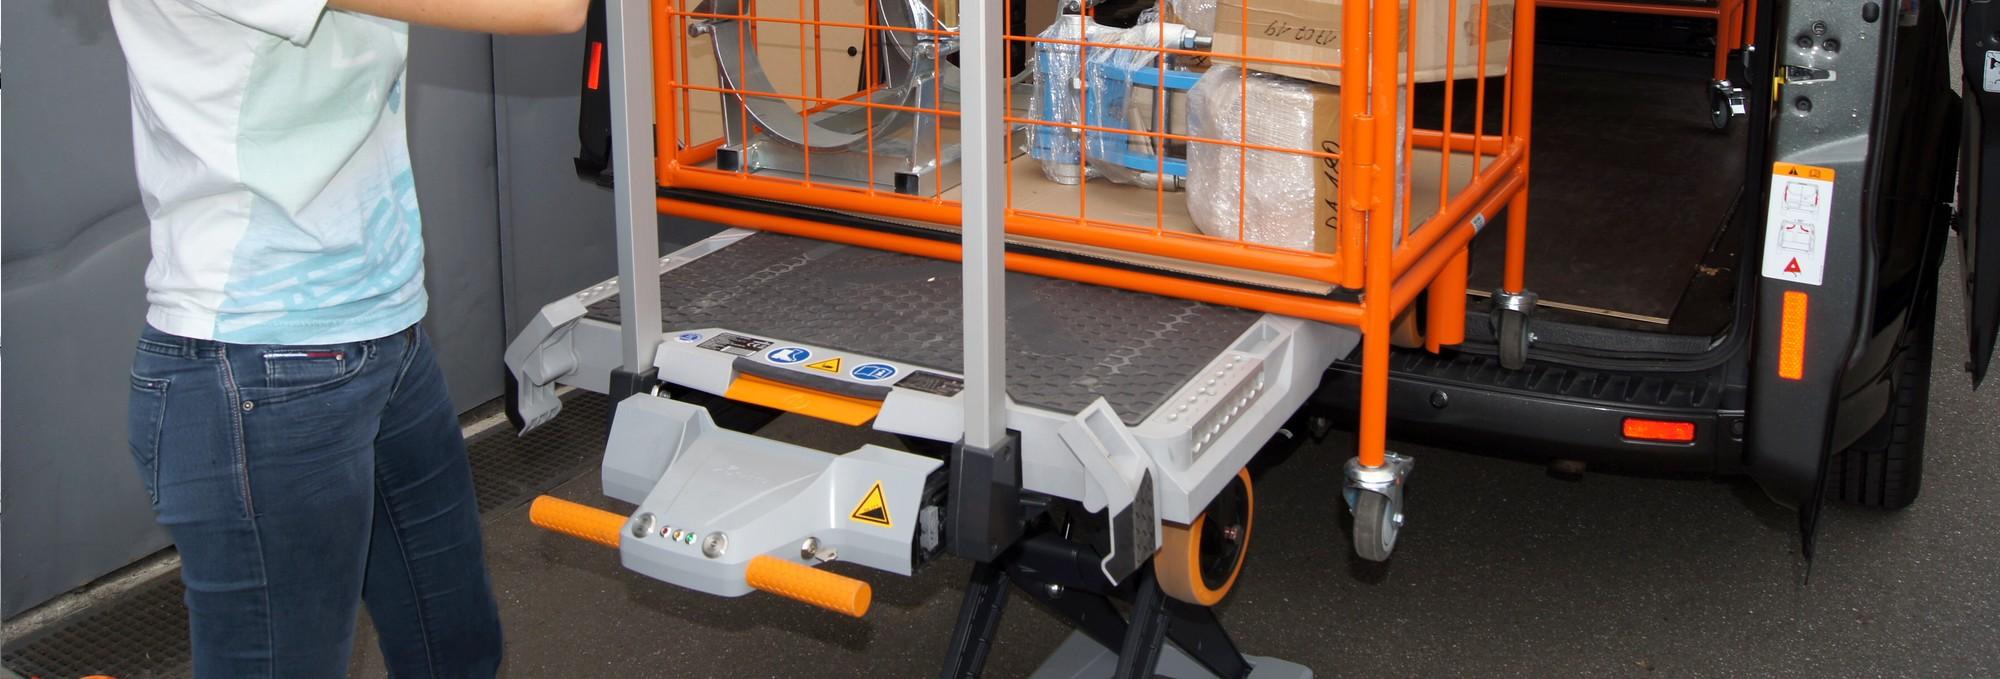 Beladesystem-Hubwagen